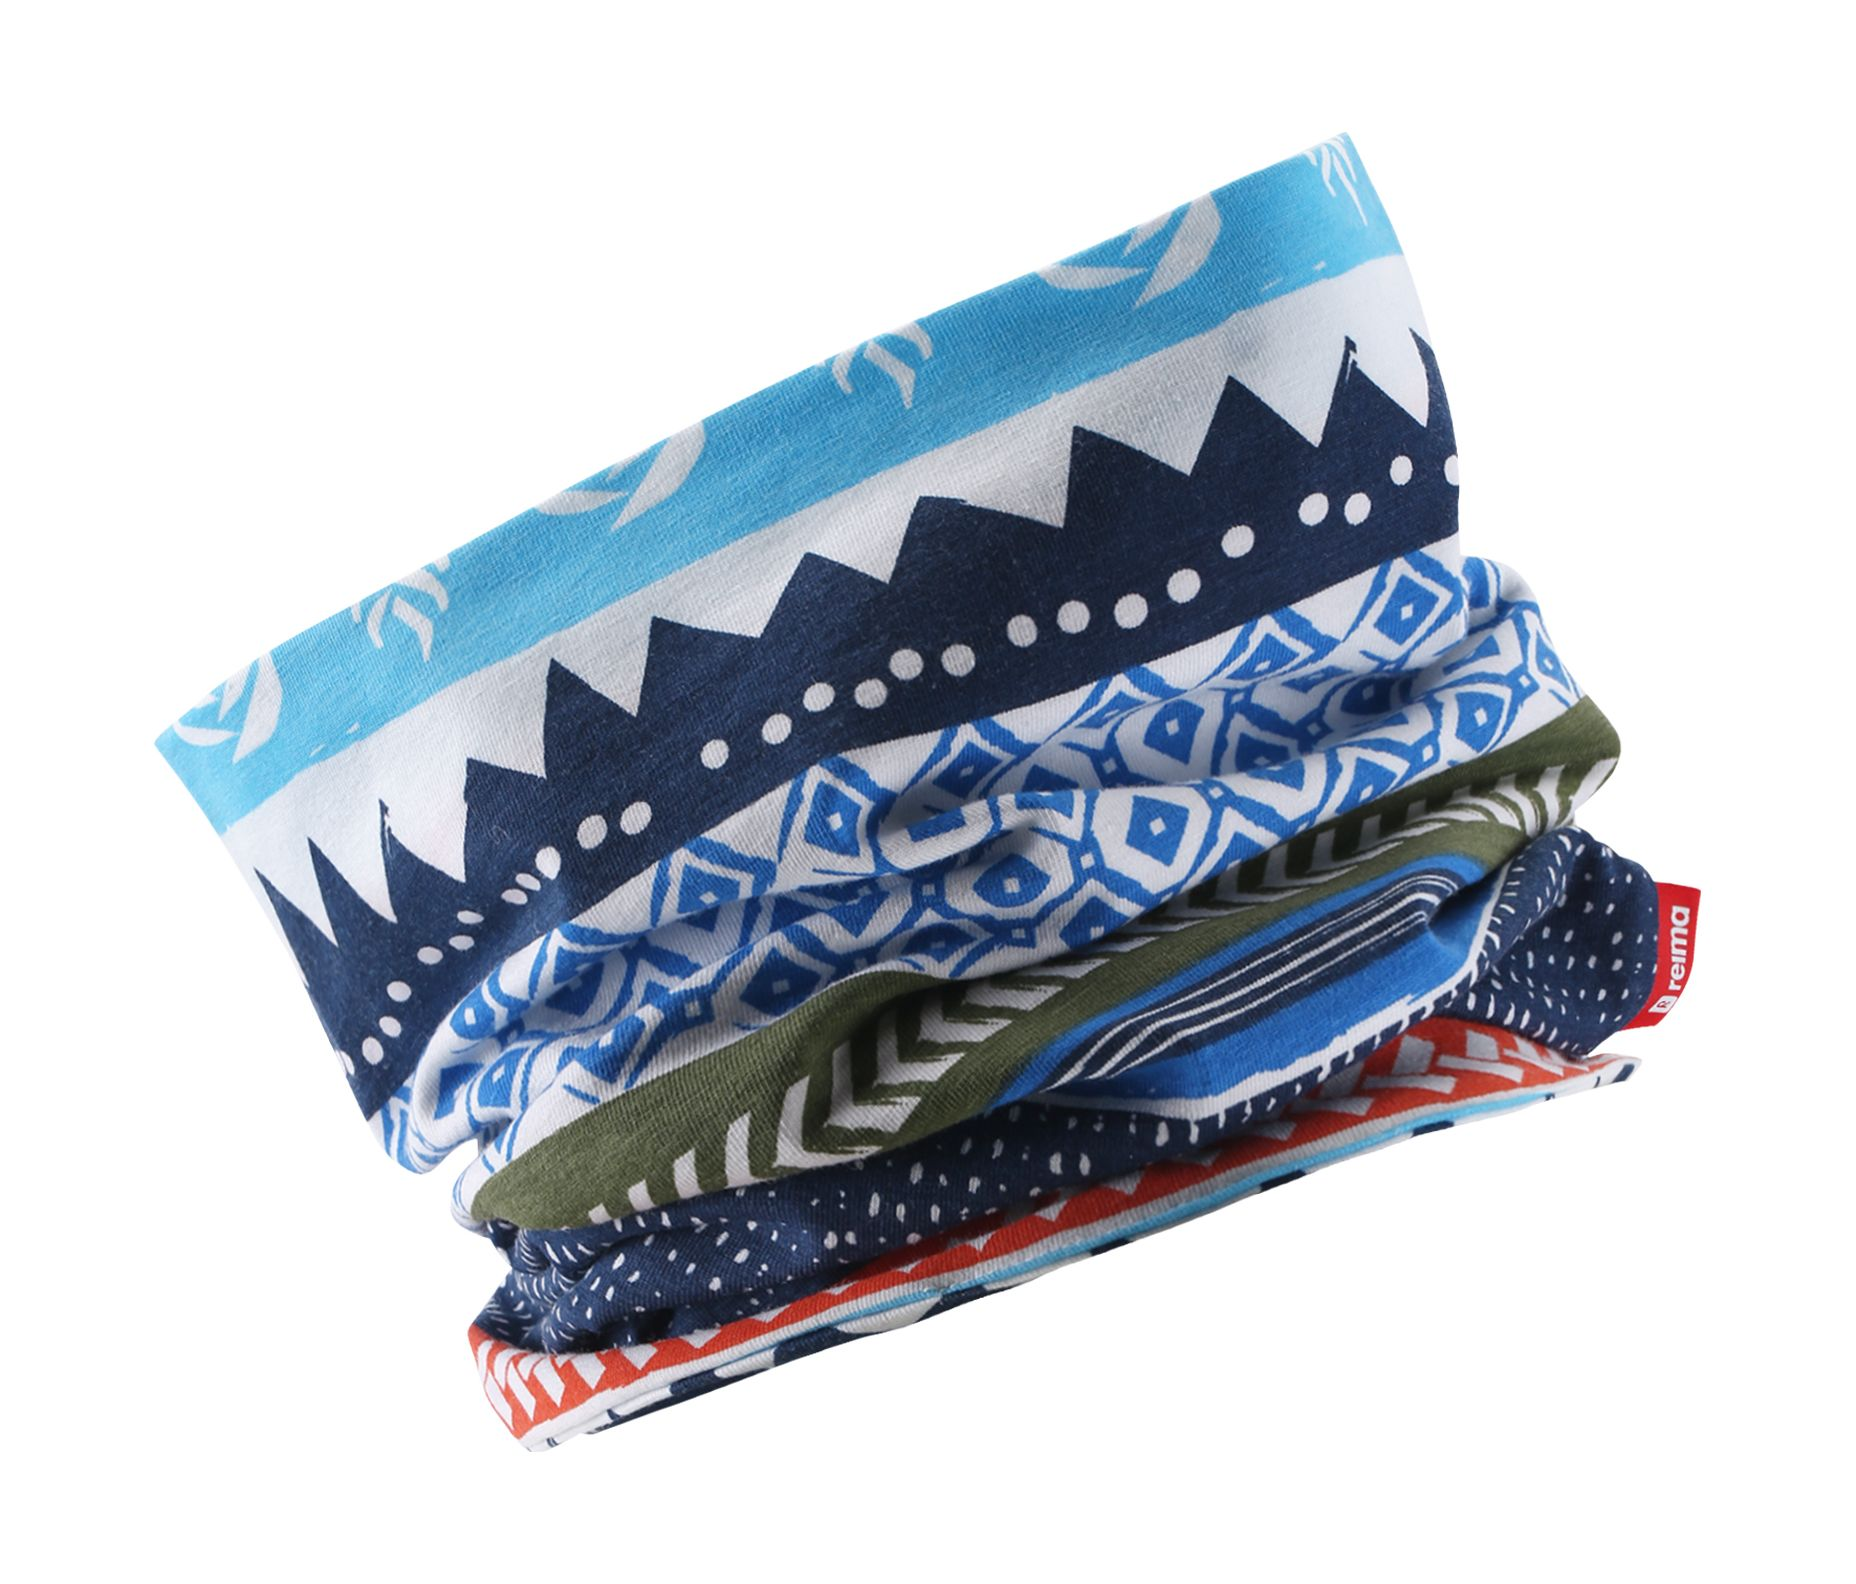 REIMA Neck Warmer 599226 Jeans Blue One size